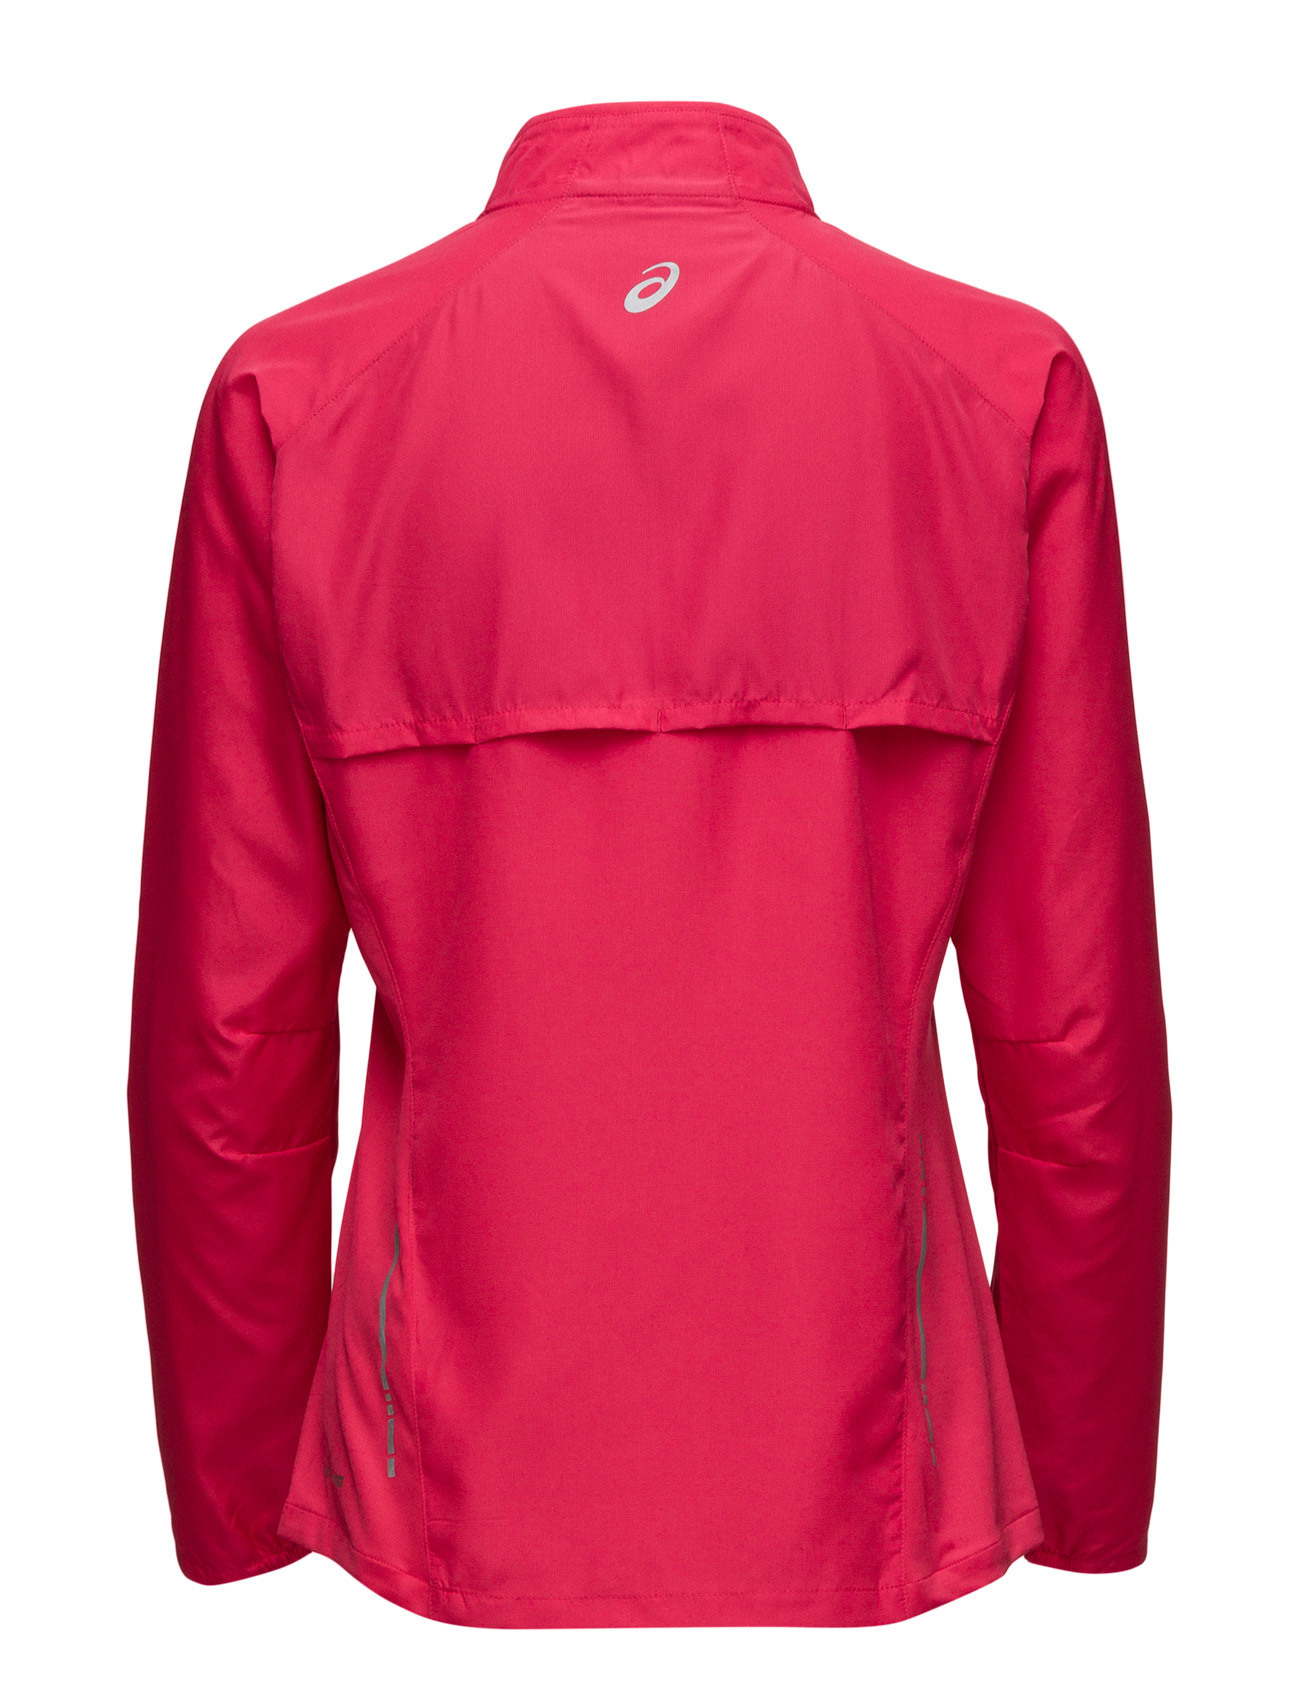 Женский костюм для бега Asics Woven WindBlock (110426 6016-121129 0904) фото